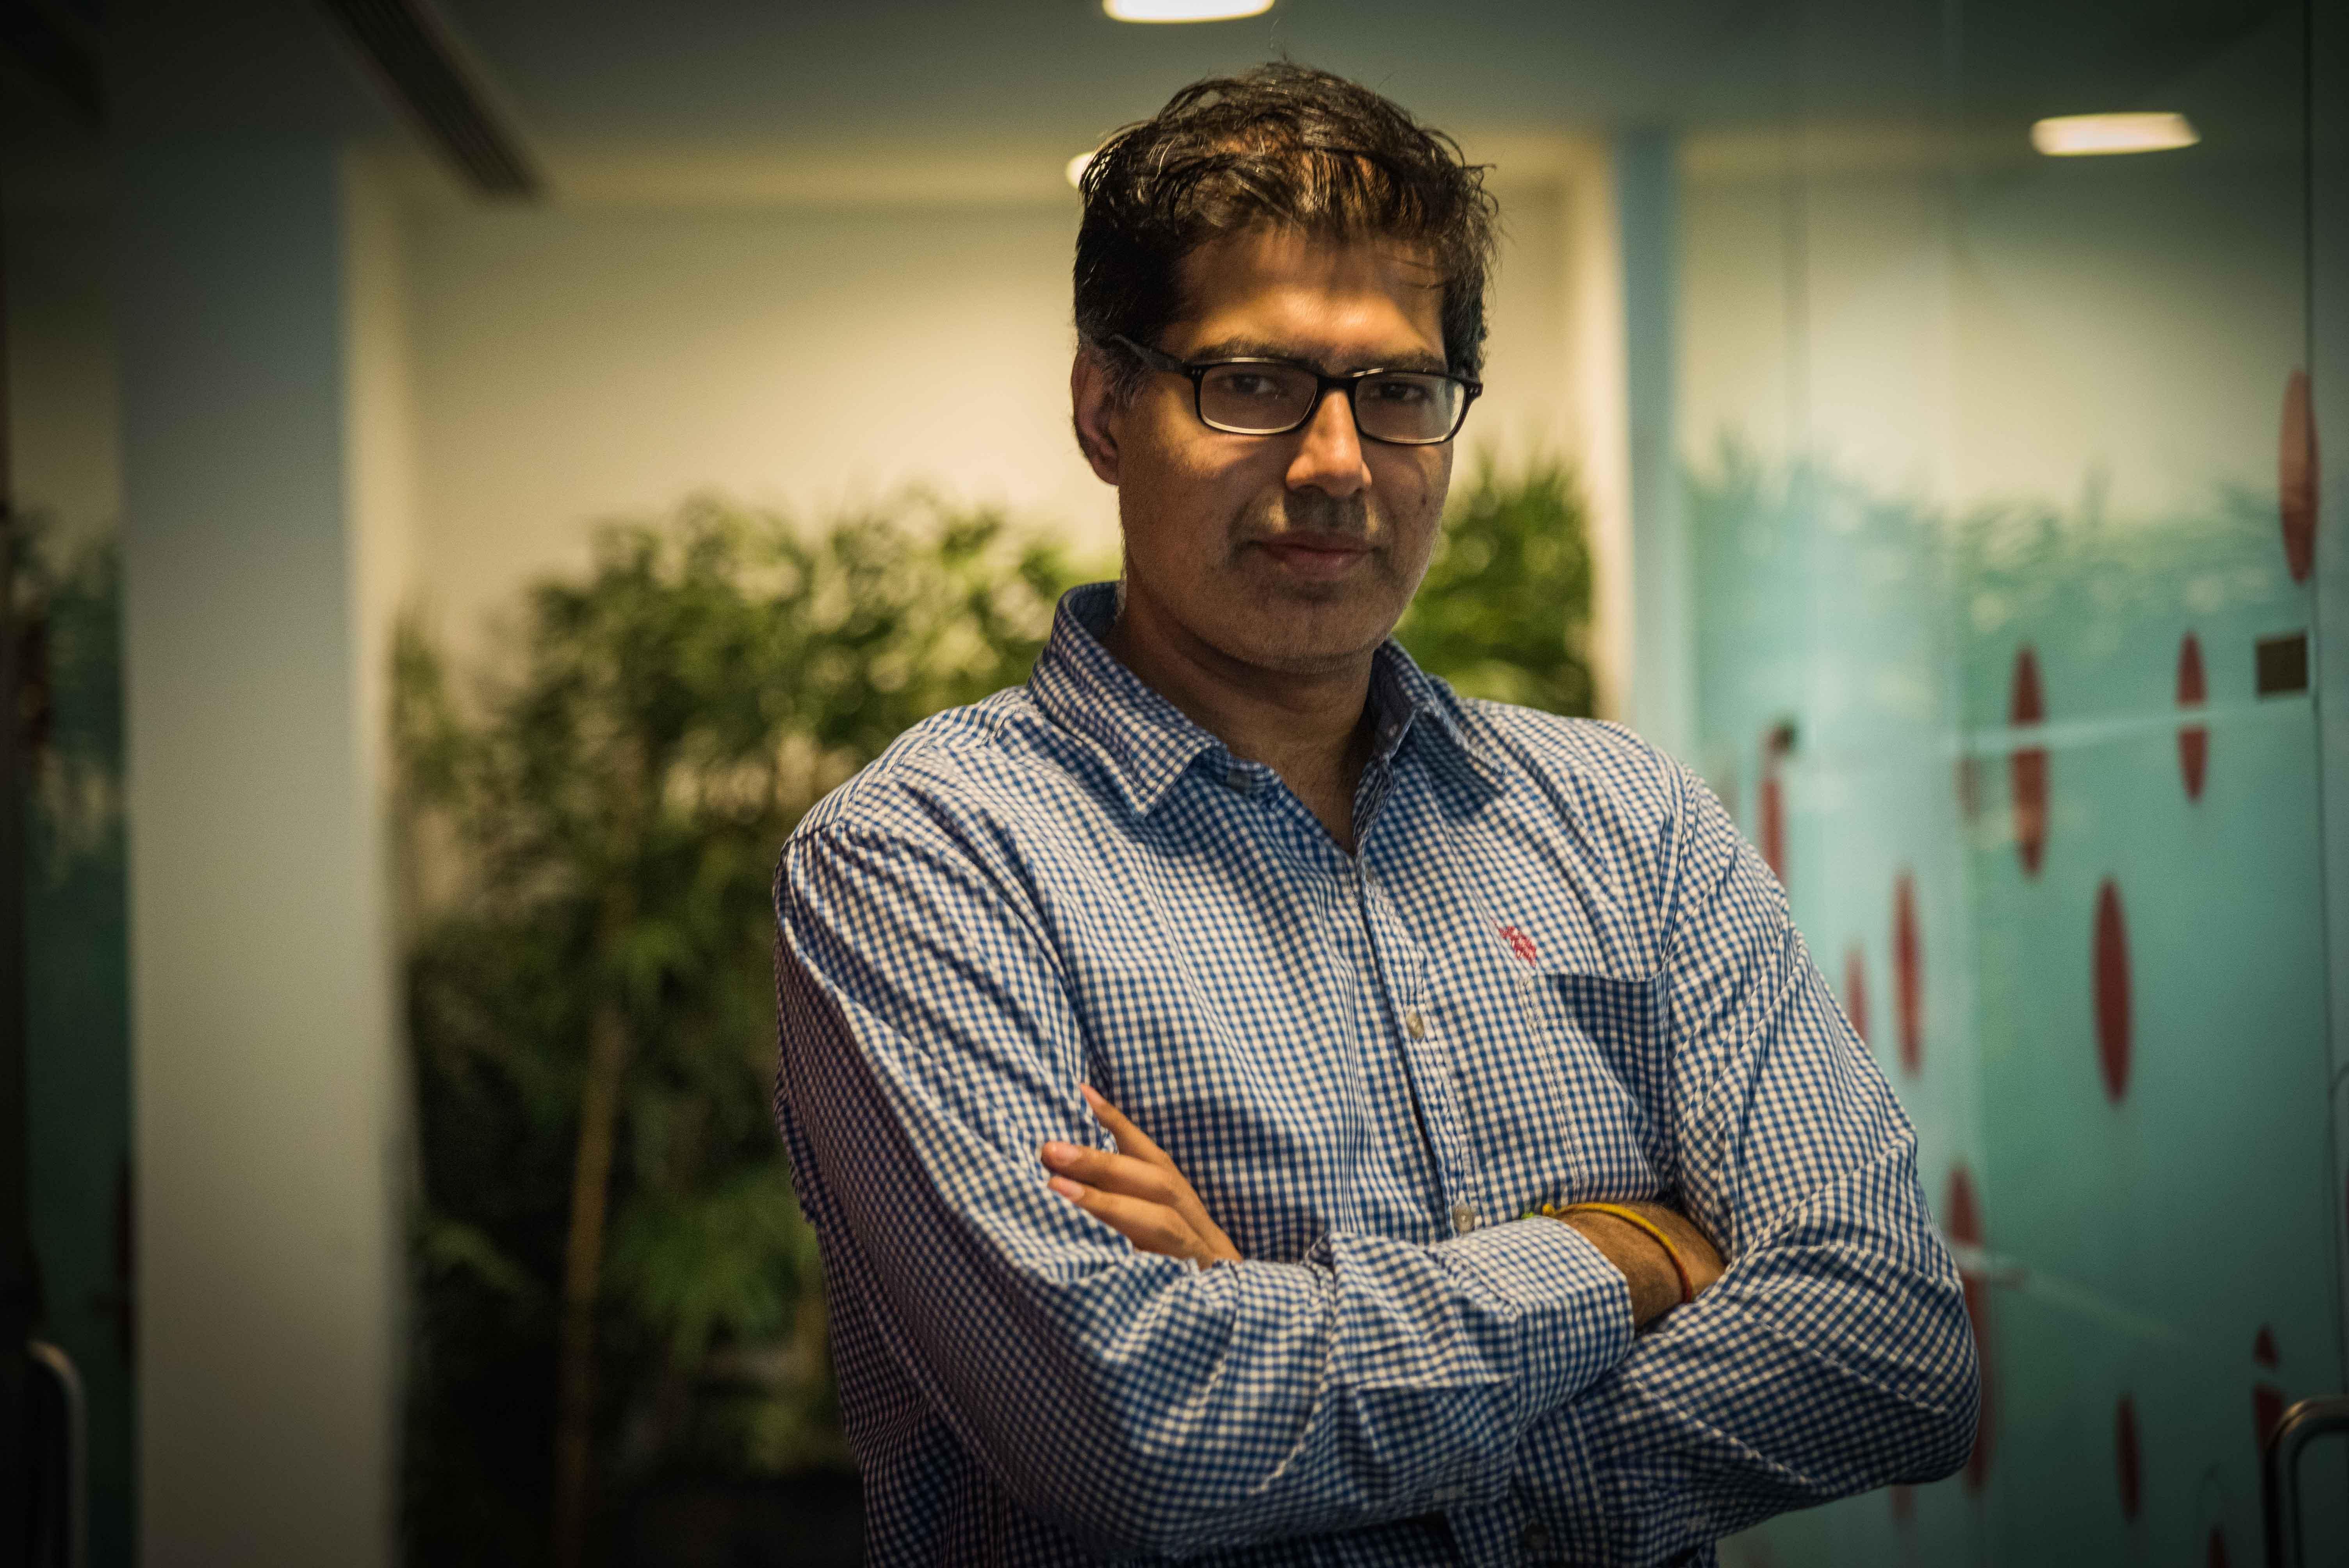 Yabx among the top Global Startups nominated for GSMA GLOMO 4YFN Impact Awards